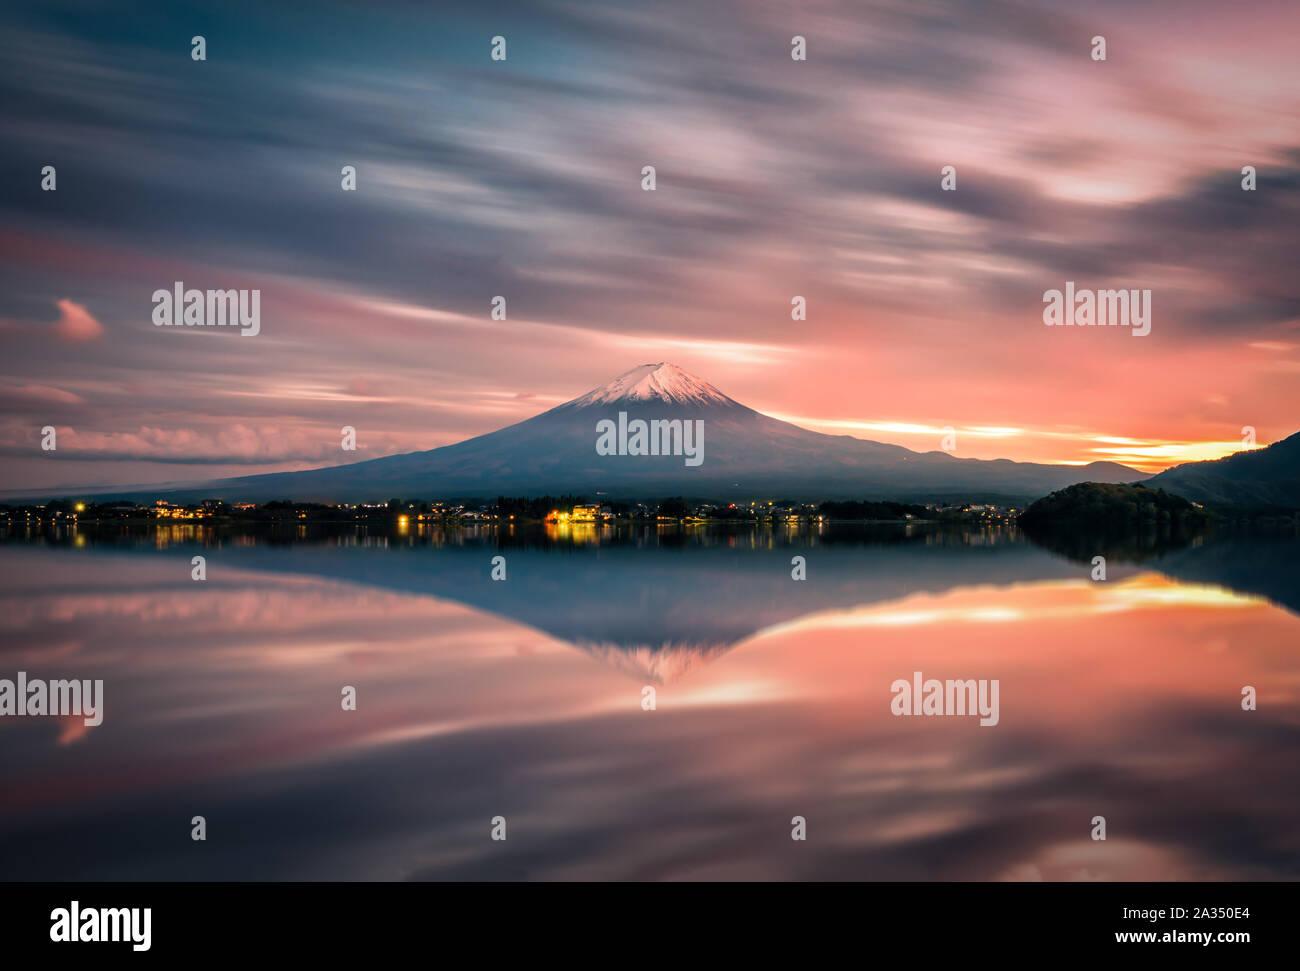 Landscape image of Mt. Fuji over Lake Kawaguchiko at sunset in Fujikawaguchiko, Japan. Stock Photo